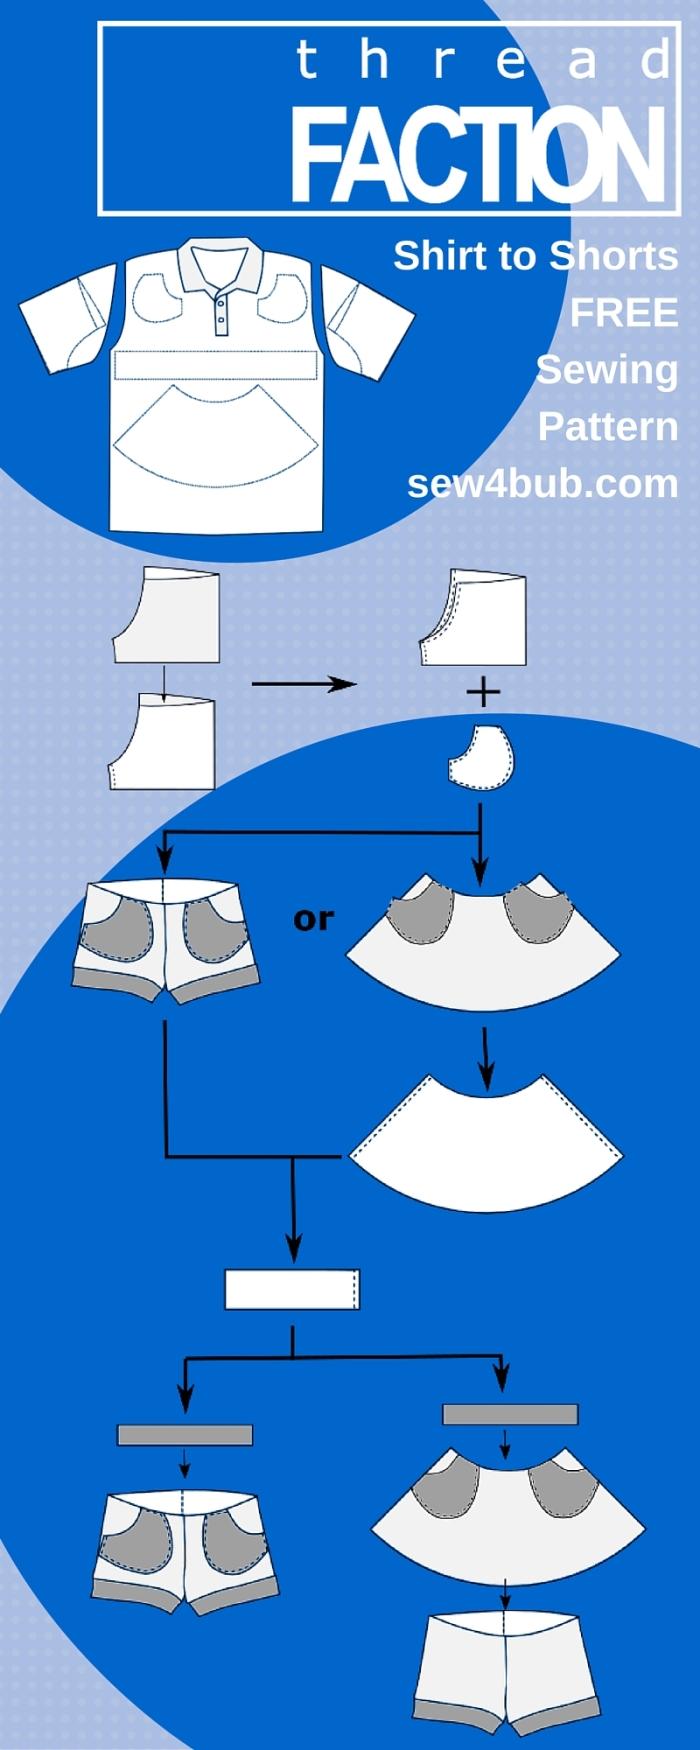 Shirt to ShortsFREE Patternsew4bub.com (1)